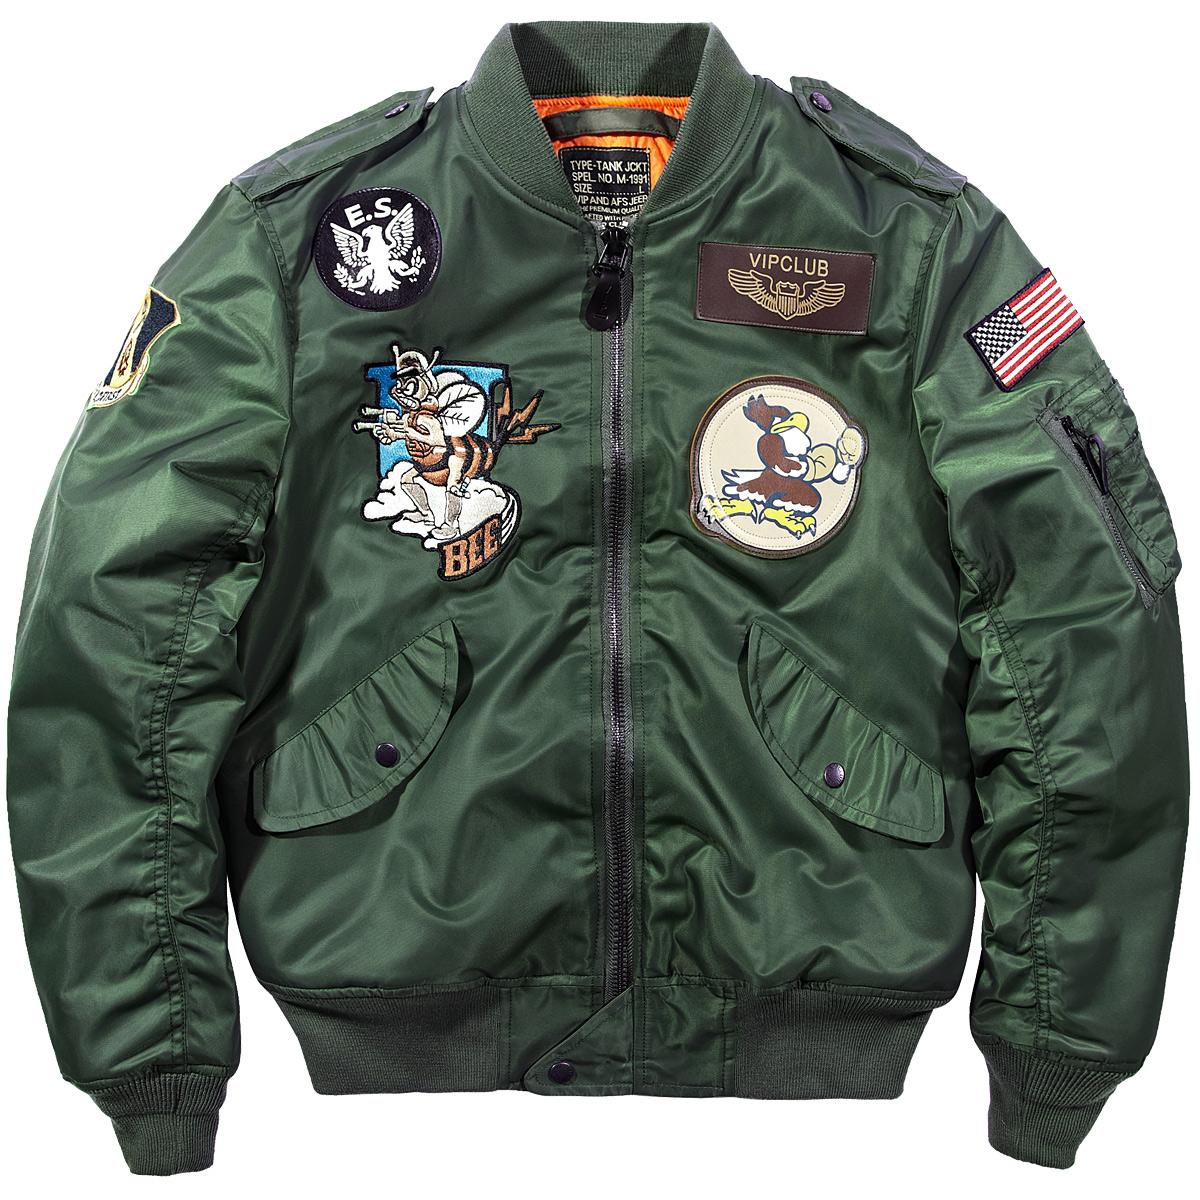 Flash Sale MA1 mantel laki-laki perkakas musim semi dan musim gugur bisbol seragam jaket